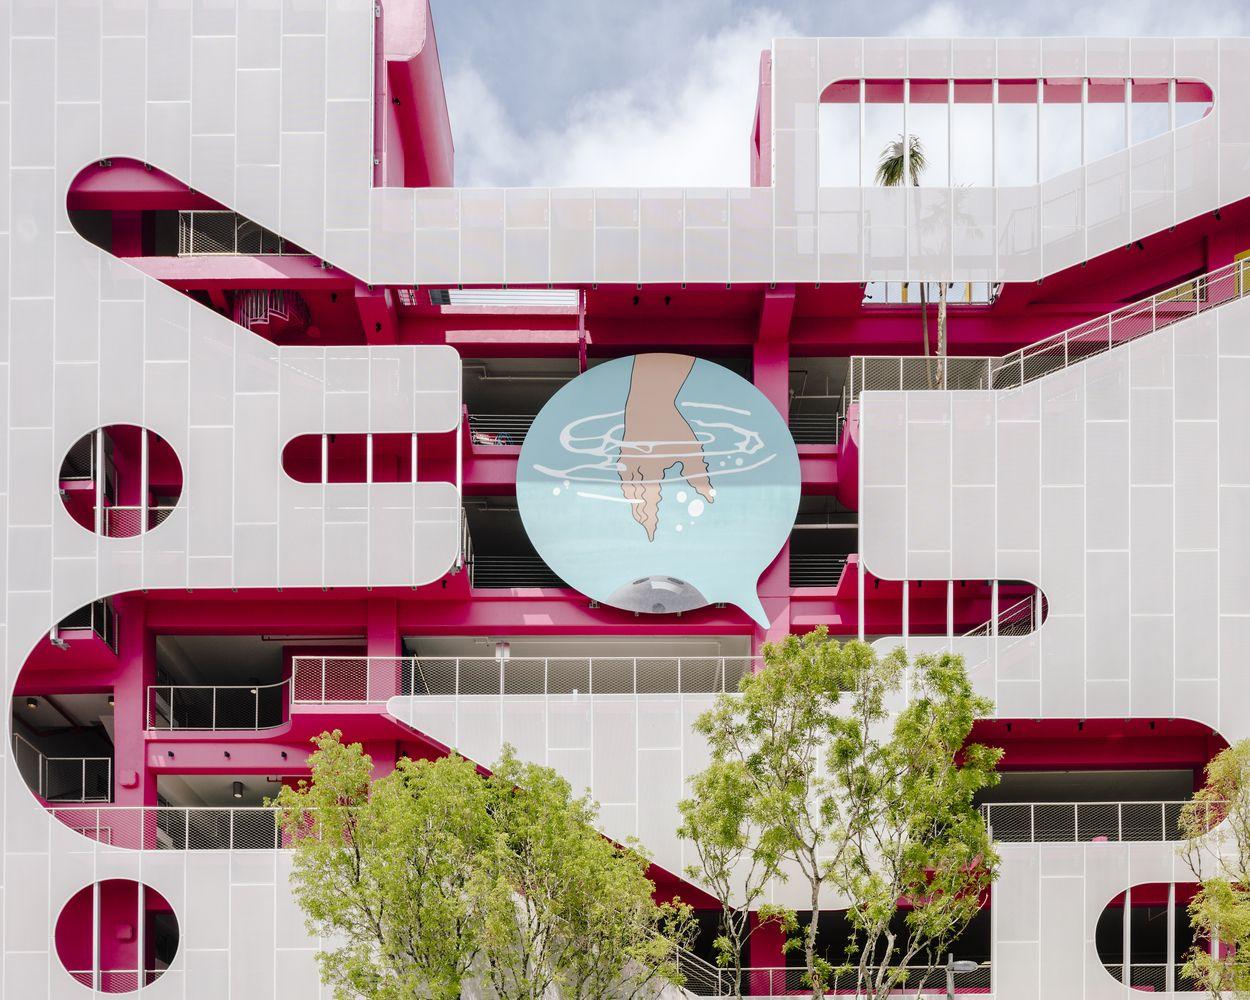 Gallery Of Miami Museum Garage Workac Nicolas Buffe Clavel Arquitectos K R And J Mayer H 5 Miami Design Container House Design Exterior Design